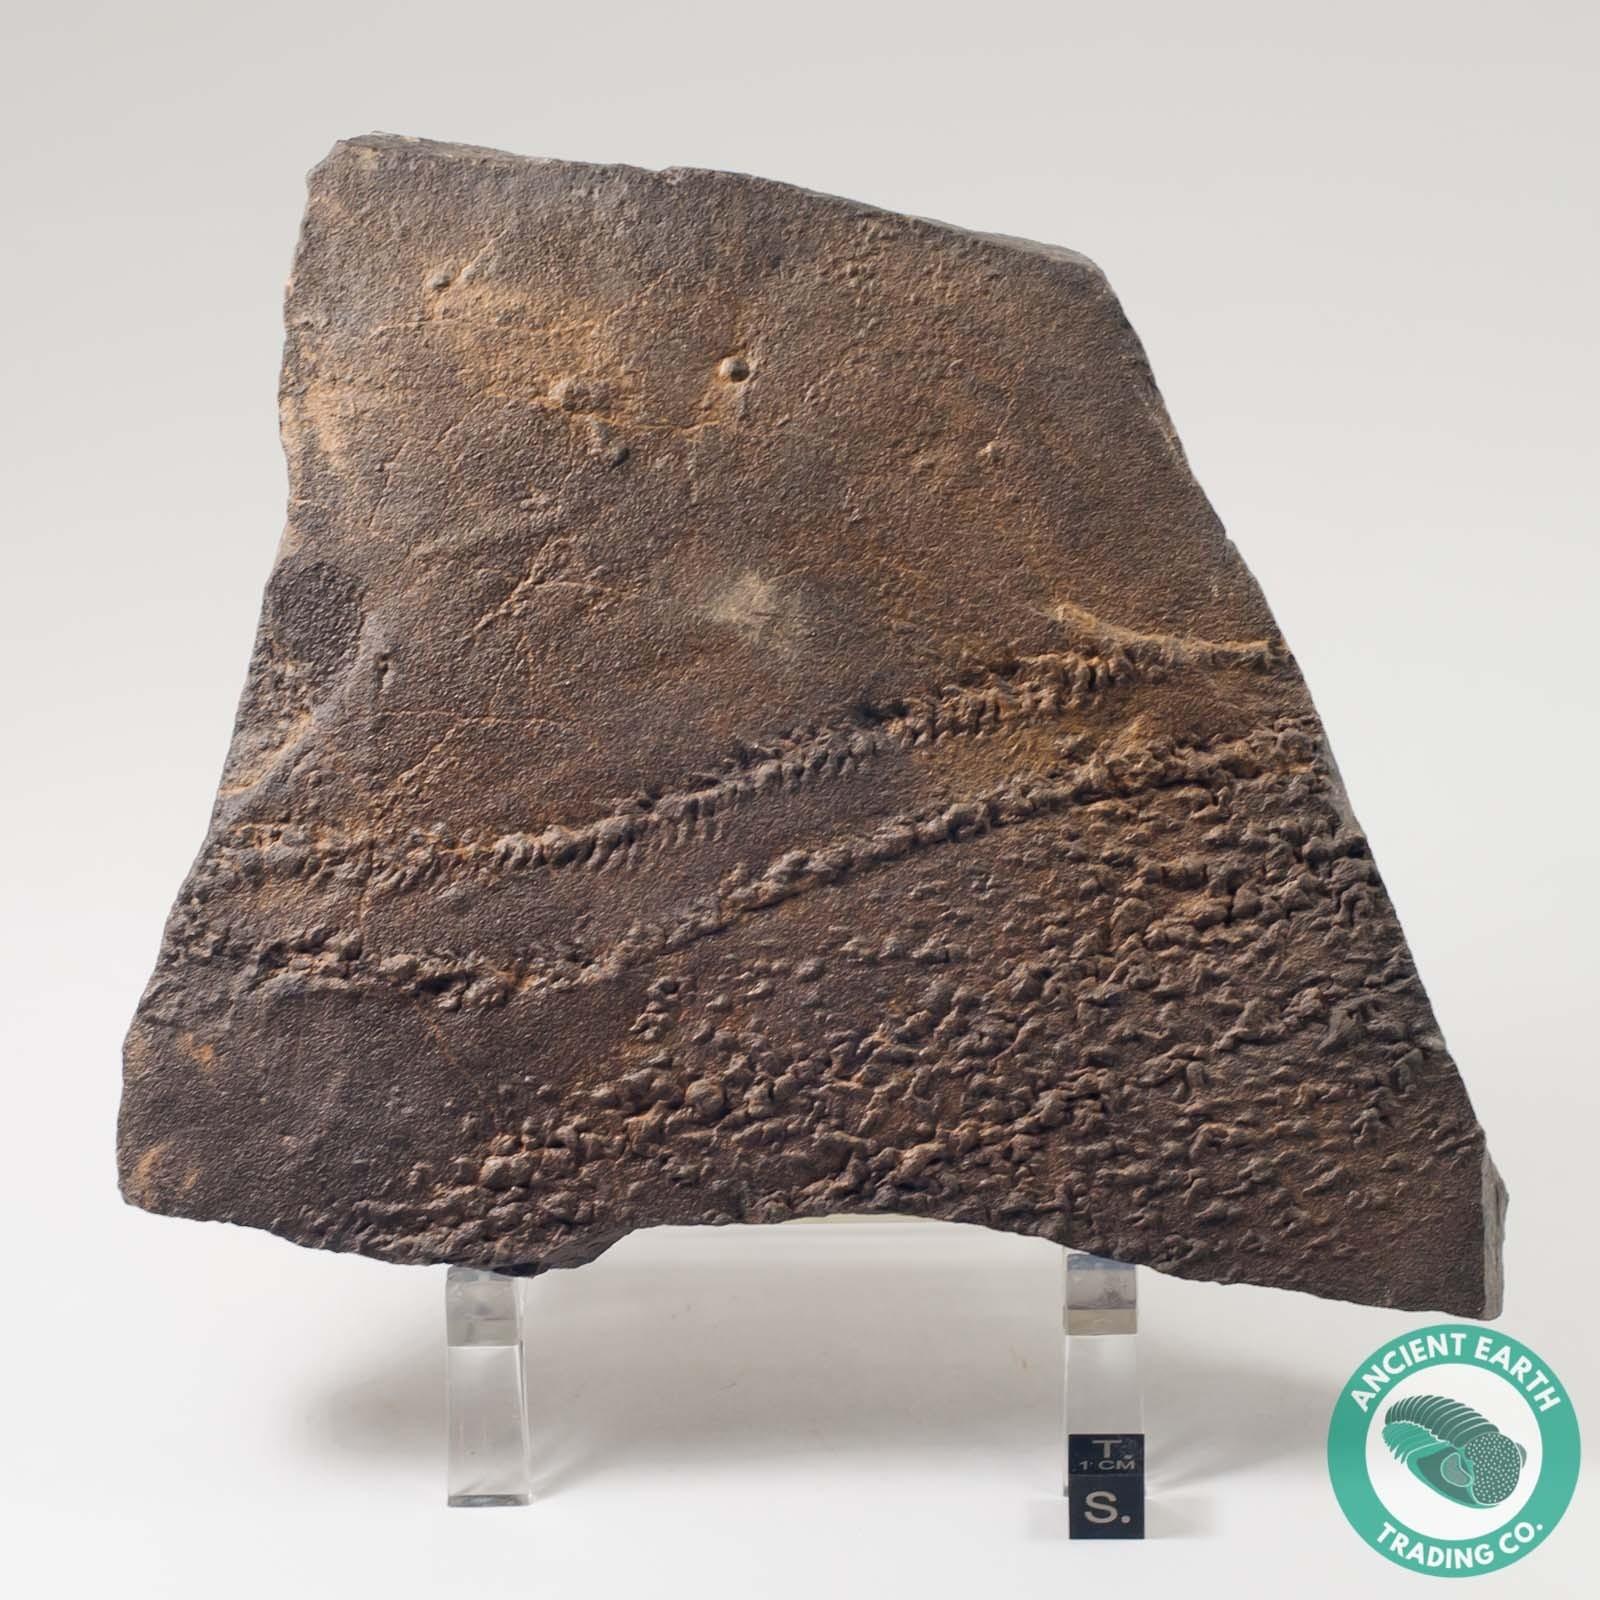 Huge Cruziana Fossil Trilobite Tracks & Starfish Tracks - Morocco